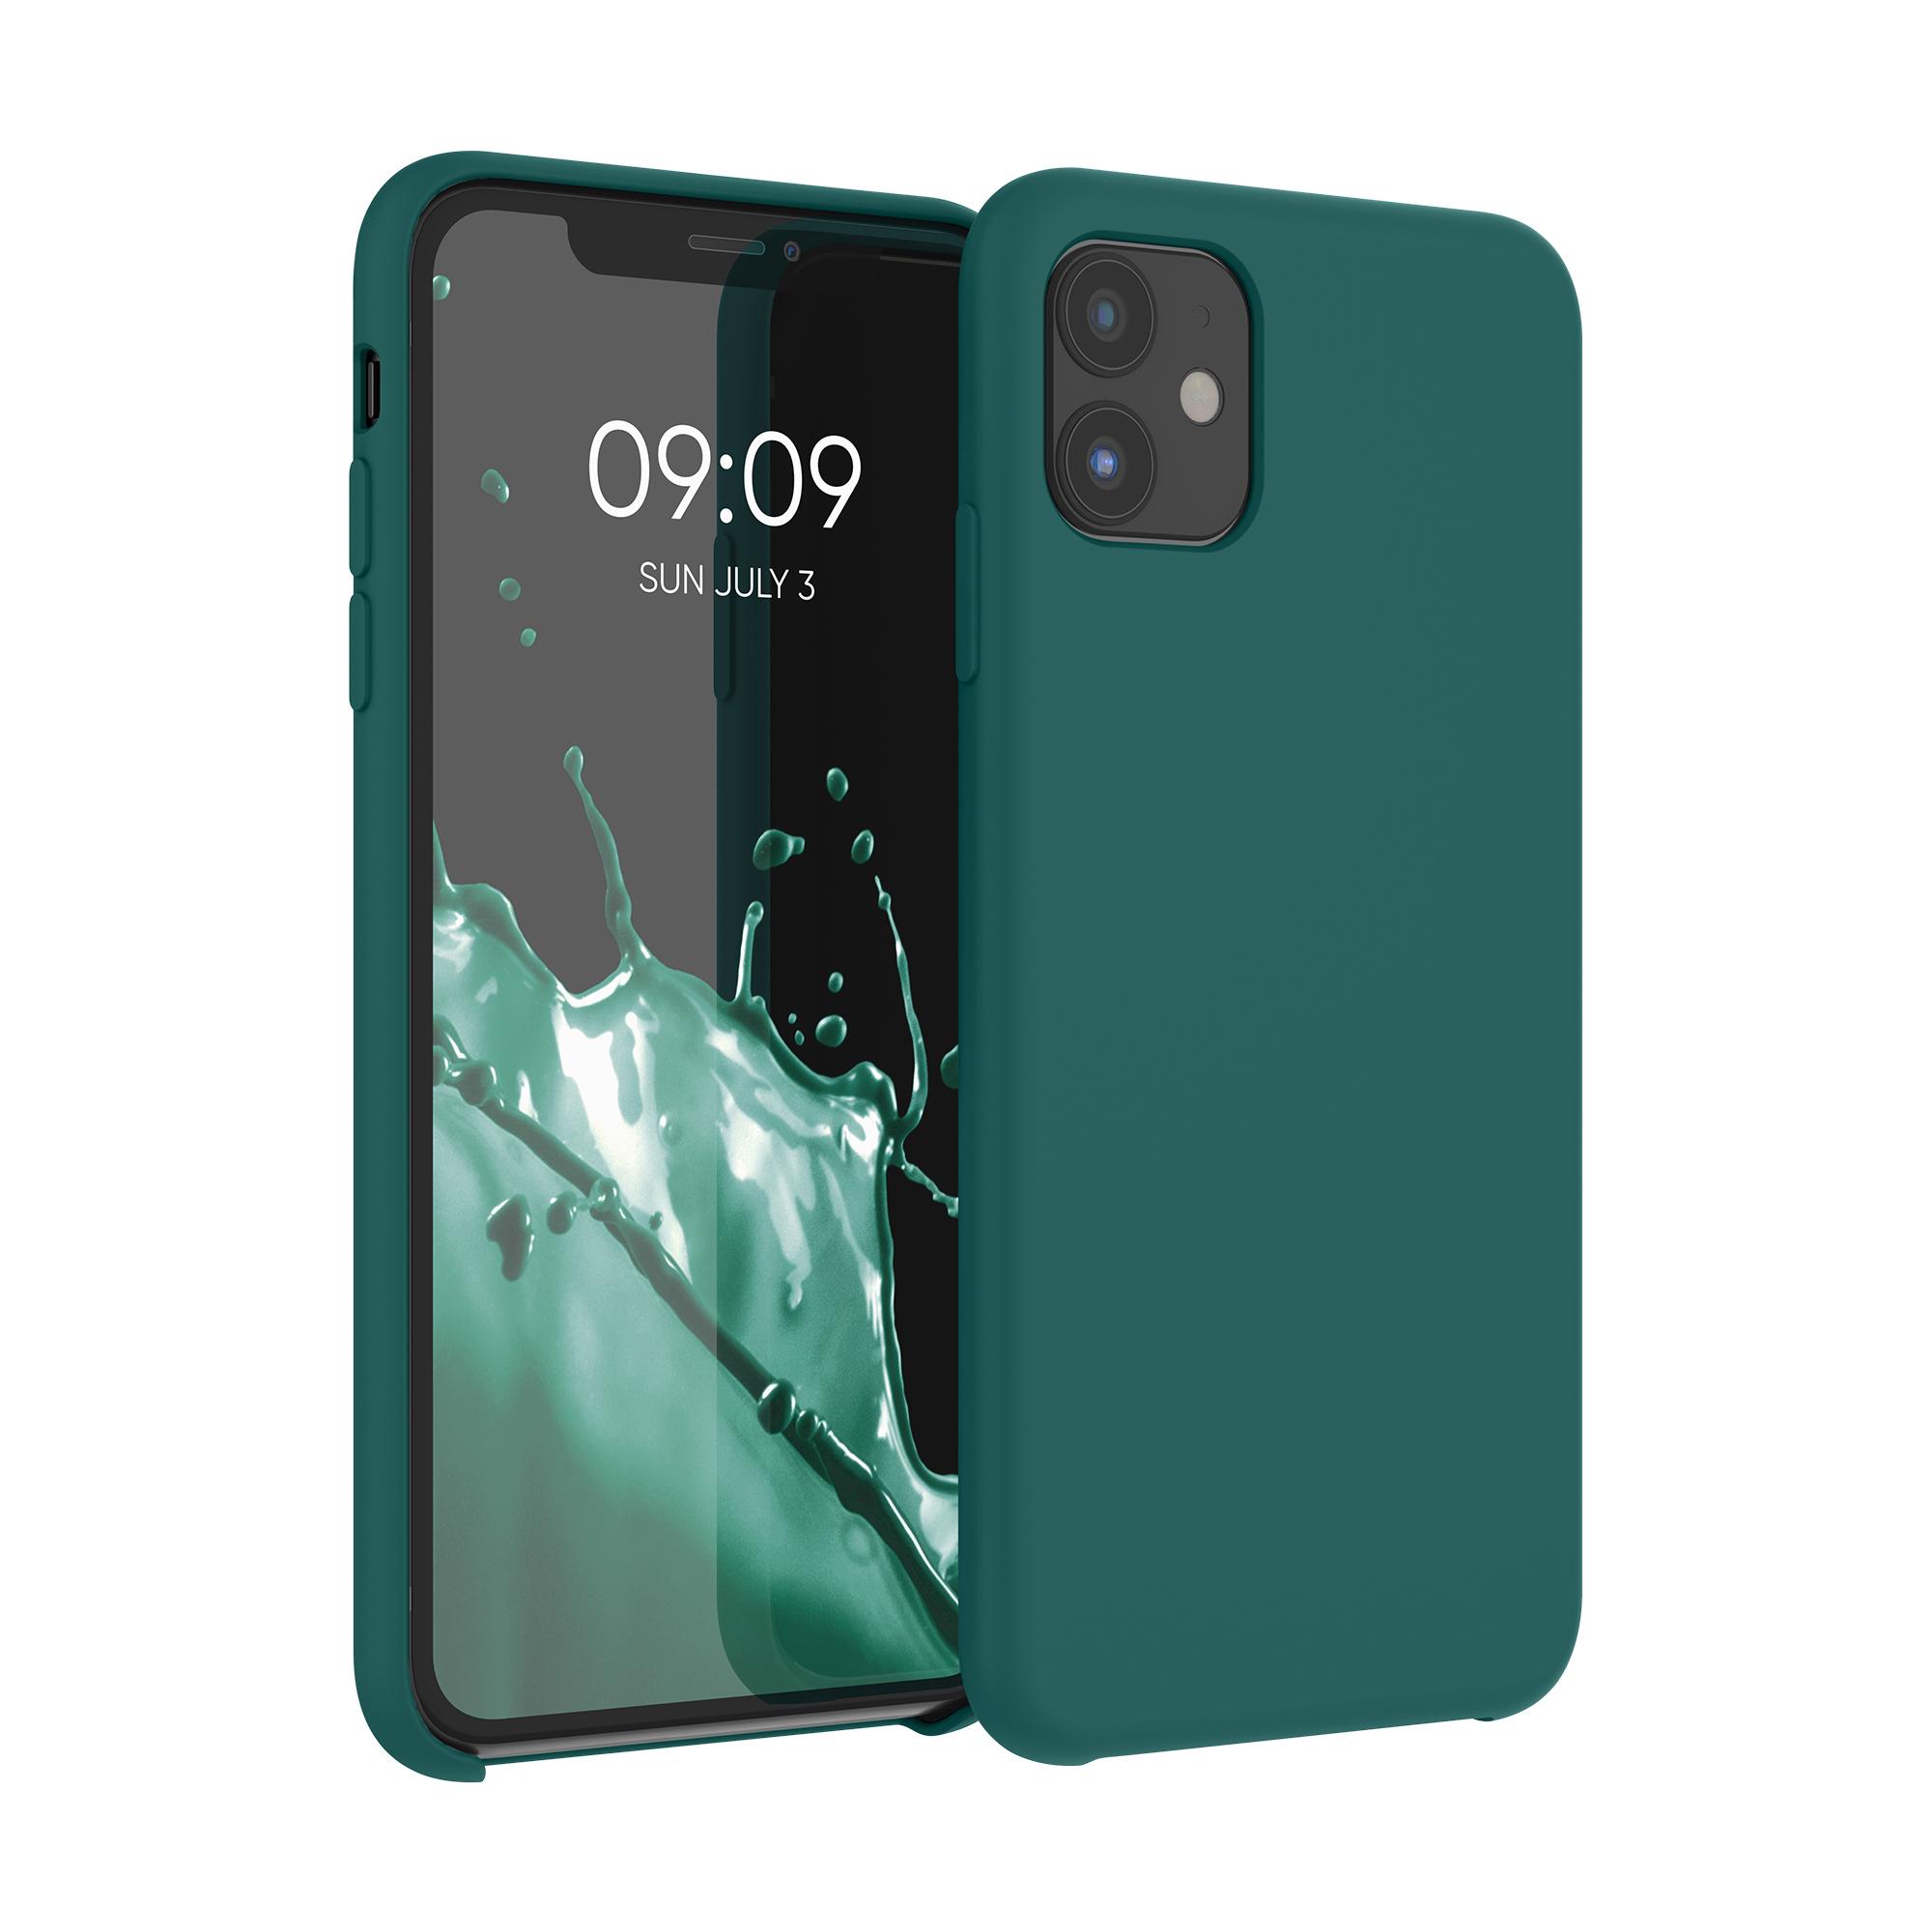 Kvalitní silikonové TPU pouzdro pro Apple iPhone 11 - Turquoise Green